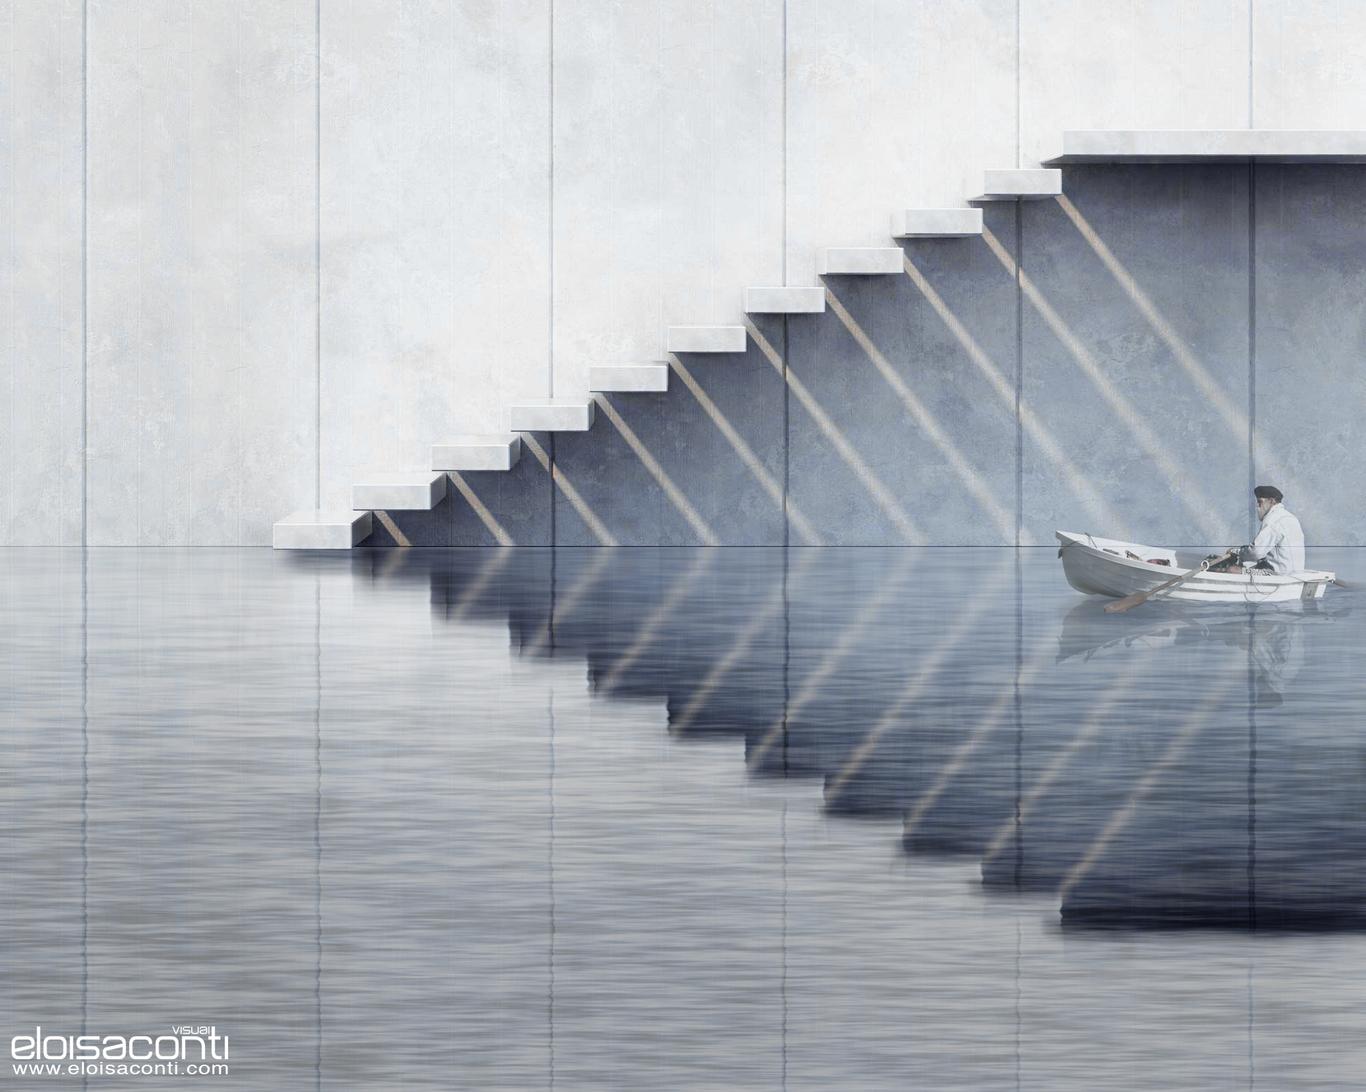 Eloisaconti stairs dot dot dot 1 b54a96c2 6unb